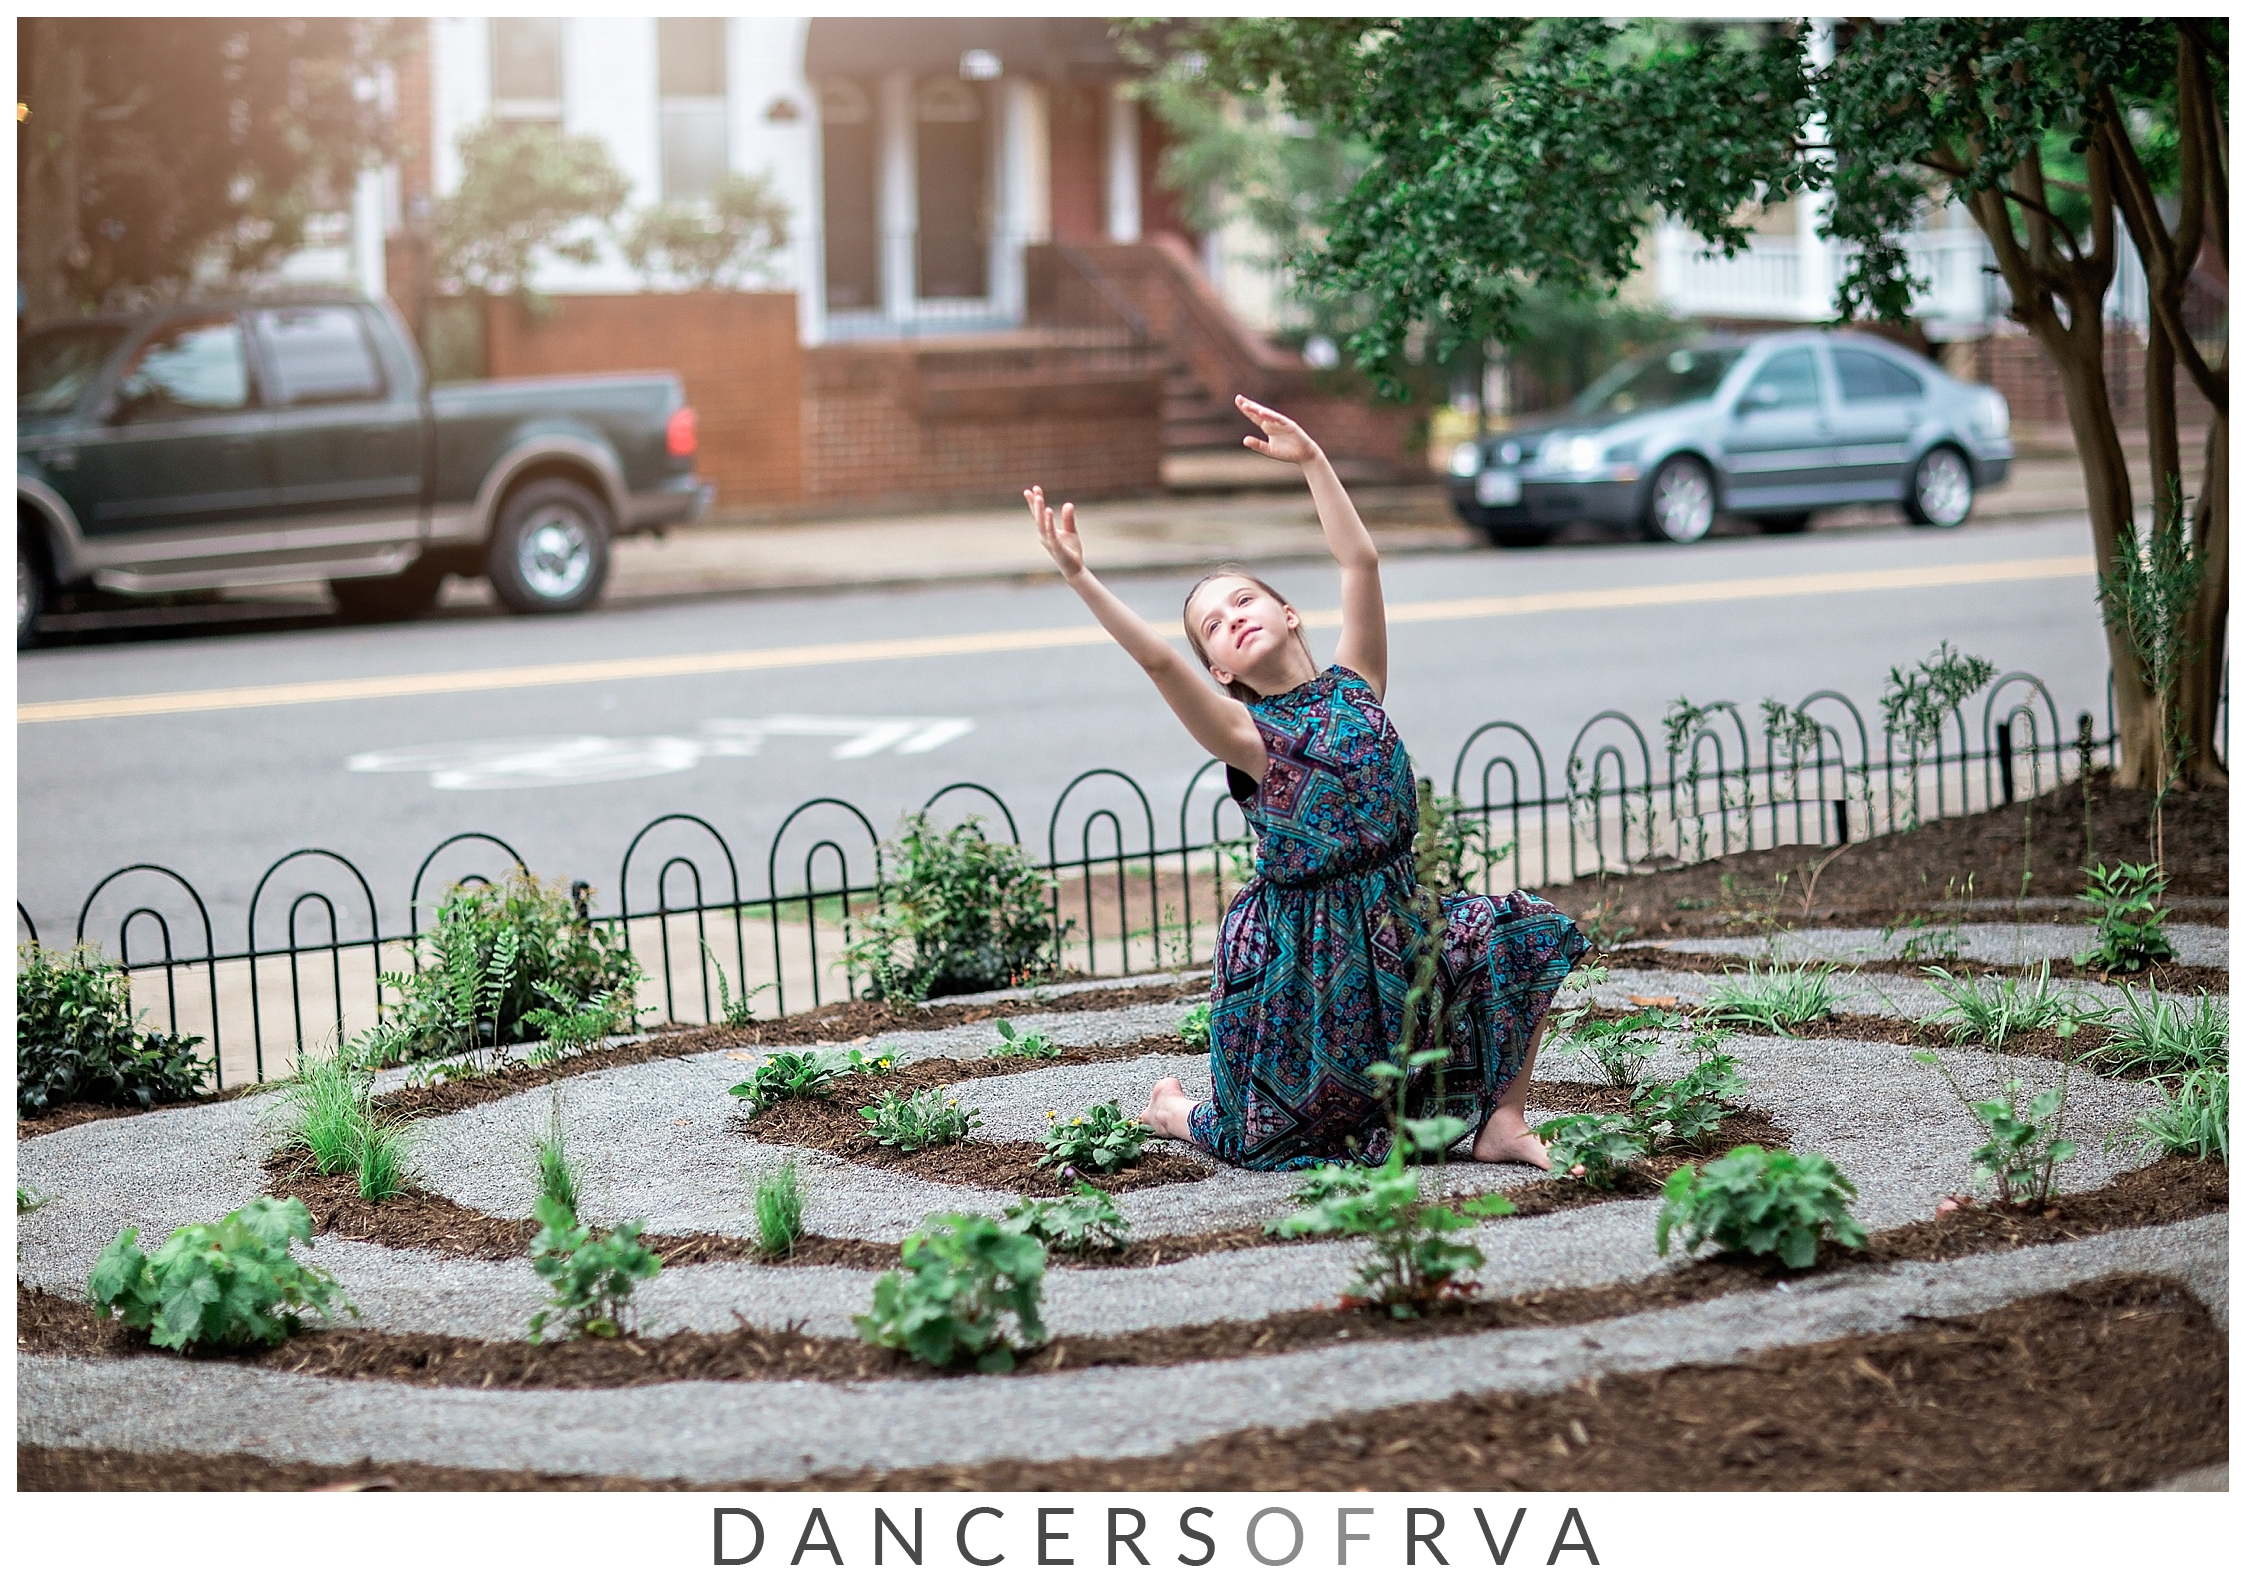 Richmond-Dance-Project-Binford-Dance-Company-Dancers-of-RVA_0013.jpg